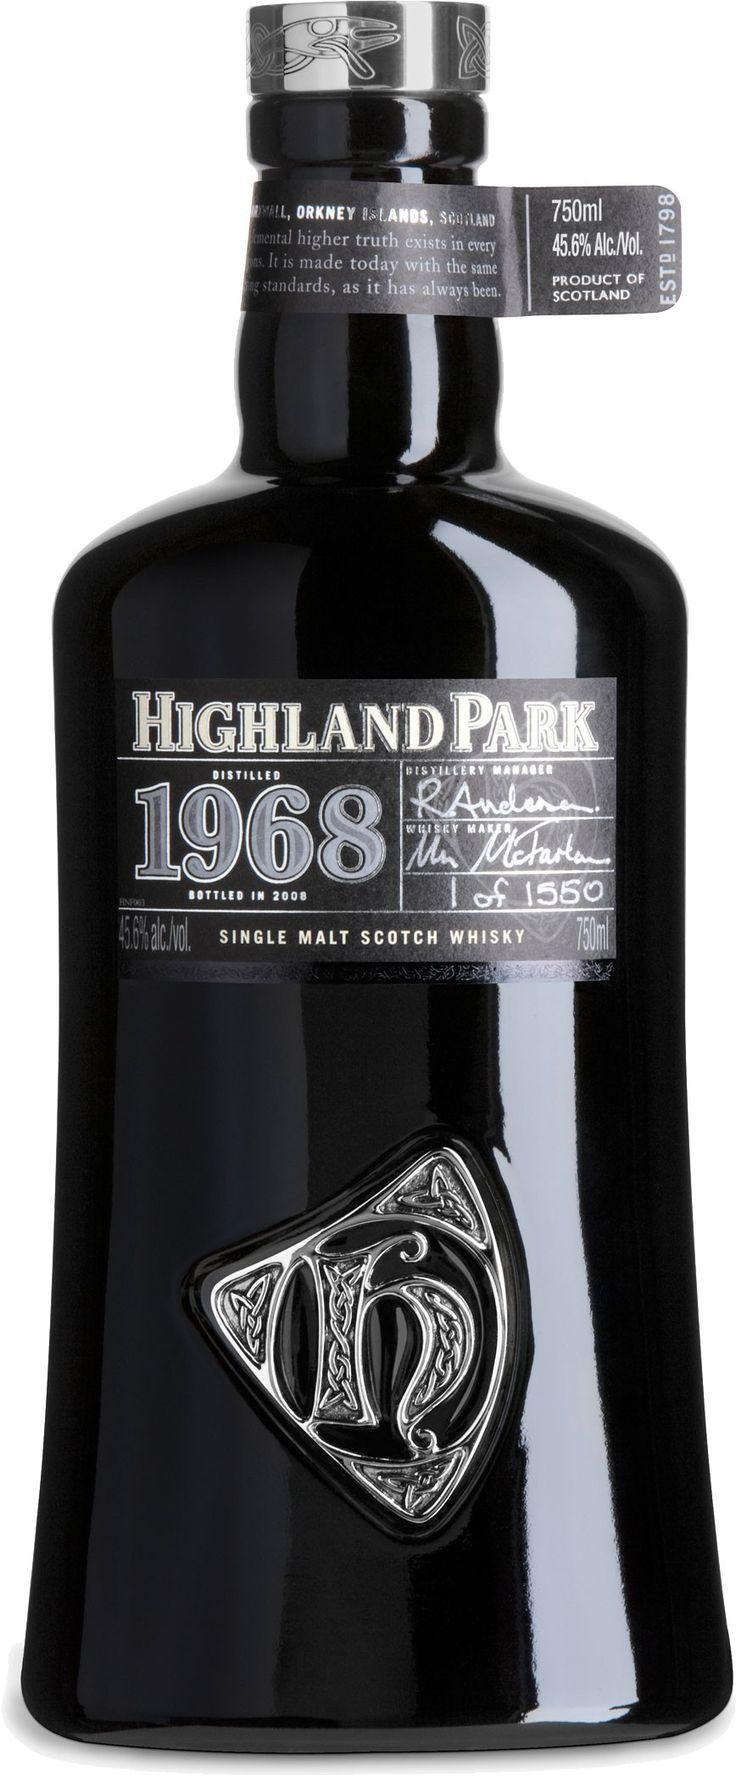 Highland Park 1968 Orcadian Vintage Single Malt Scotch Whisky   @Caskers